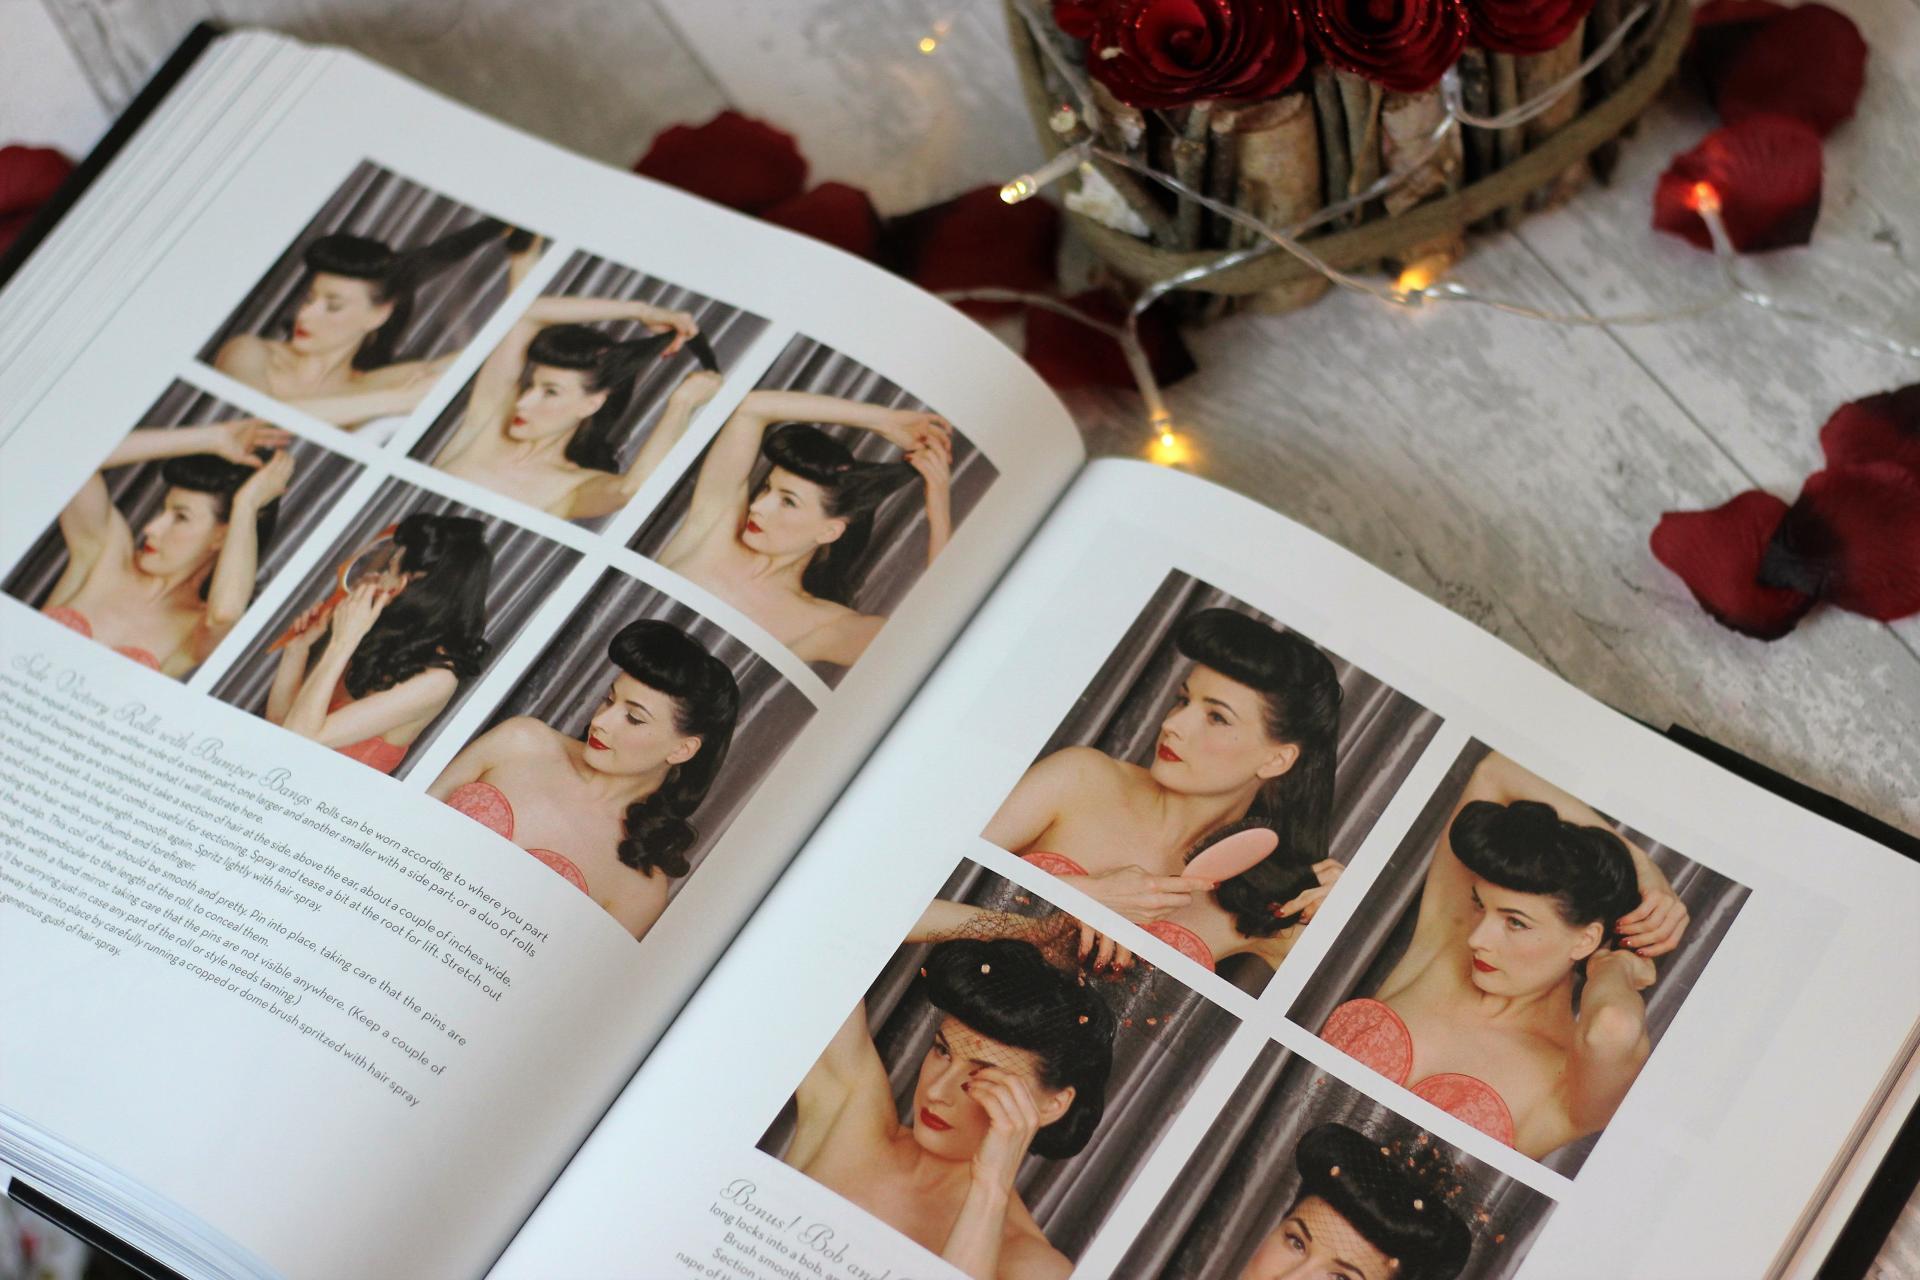 dita von teese your beauty mark pdf